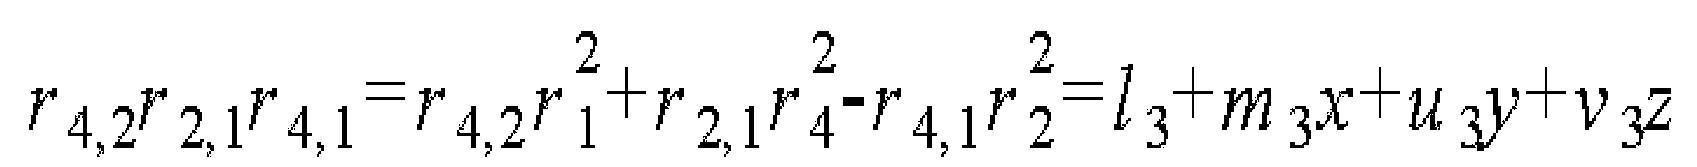 Figure 112007062753914-pat00011